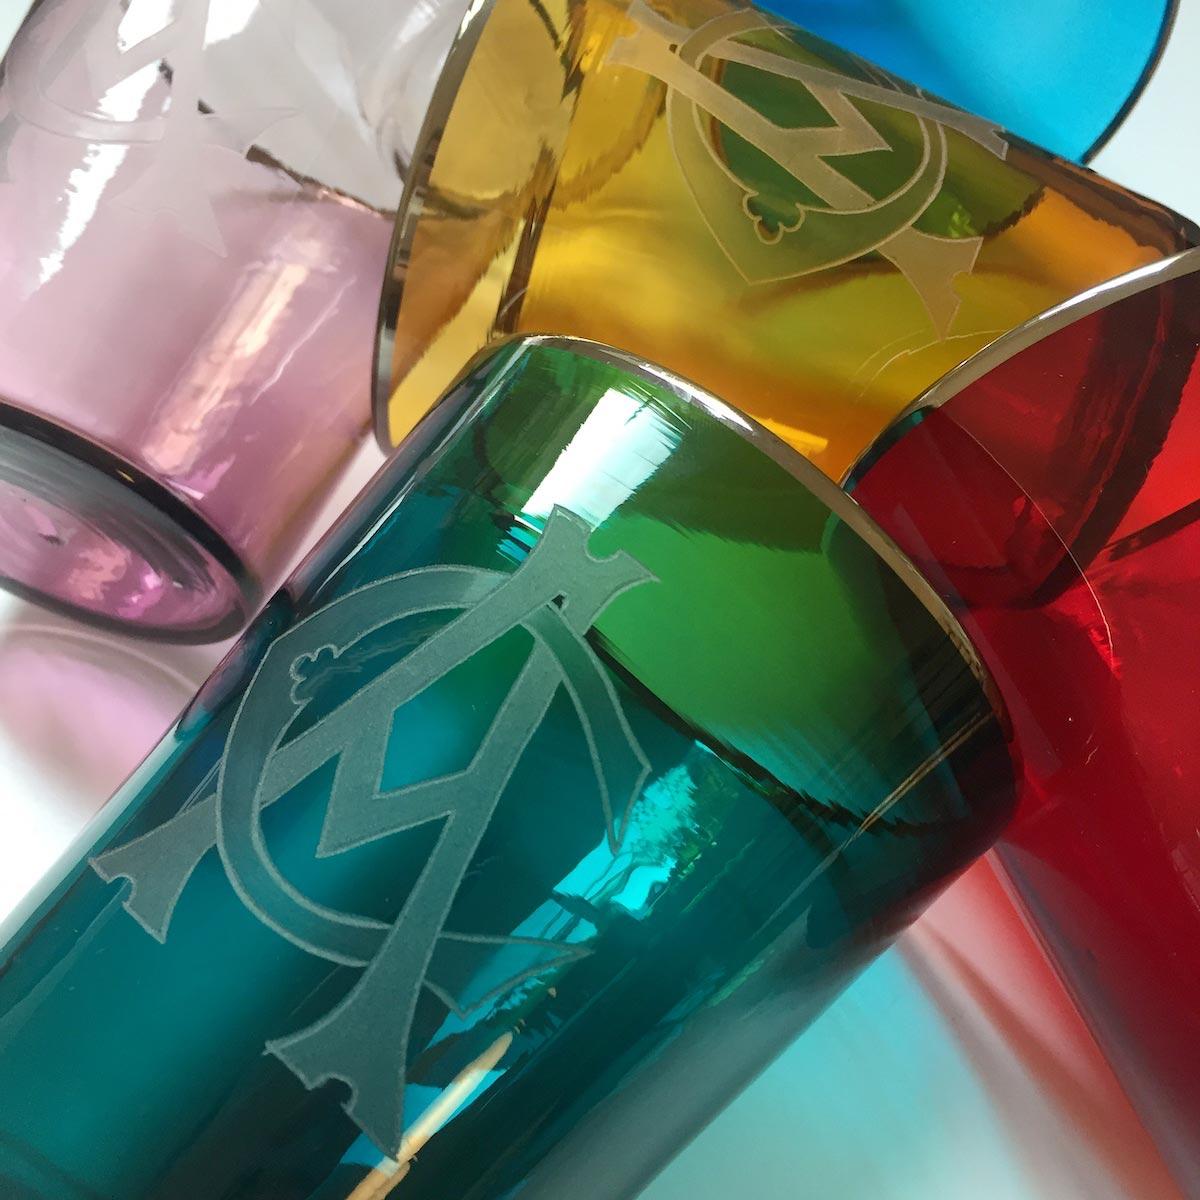 vaso-engraved-colorful-glasses-designer-monogram-initials-handmade-venice-italian